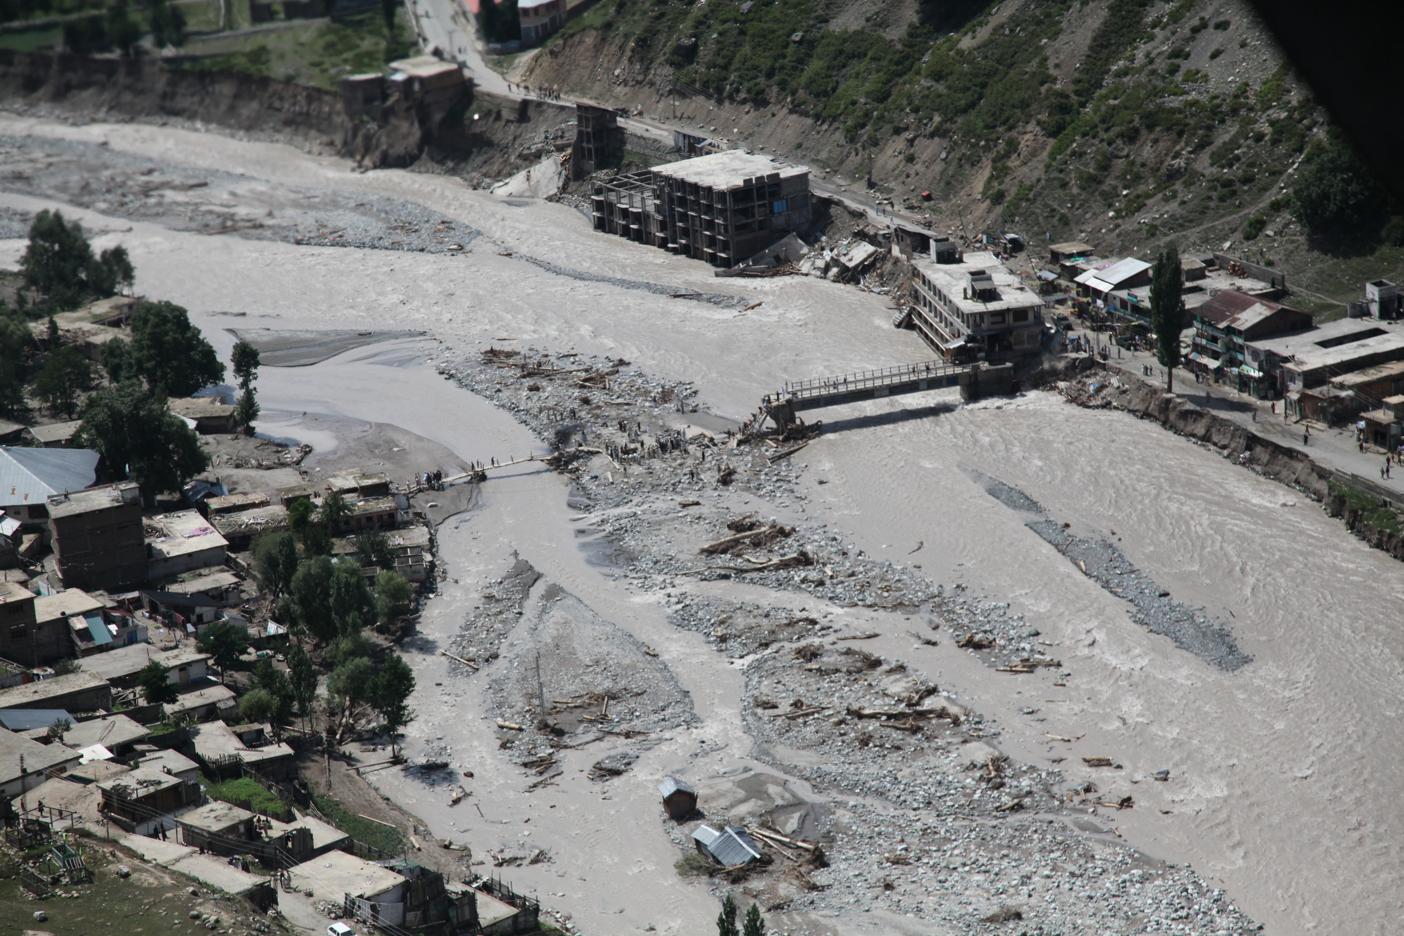 https://i0.wp.com/upload.wikimedia.org/wikipedia/commons/f/f9/Damaged_bridge_from_flooding_in_Pakistan%2C_2010.JPG